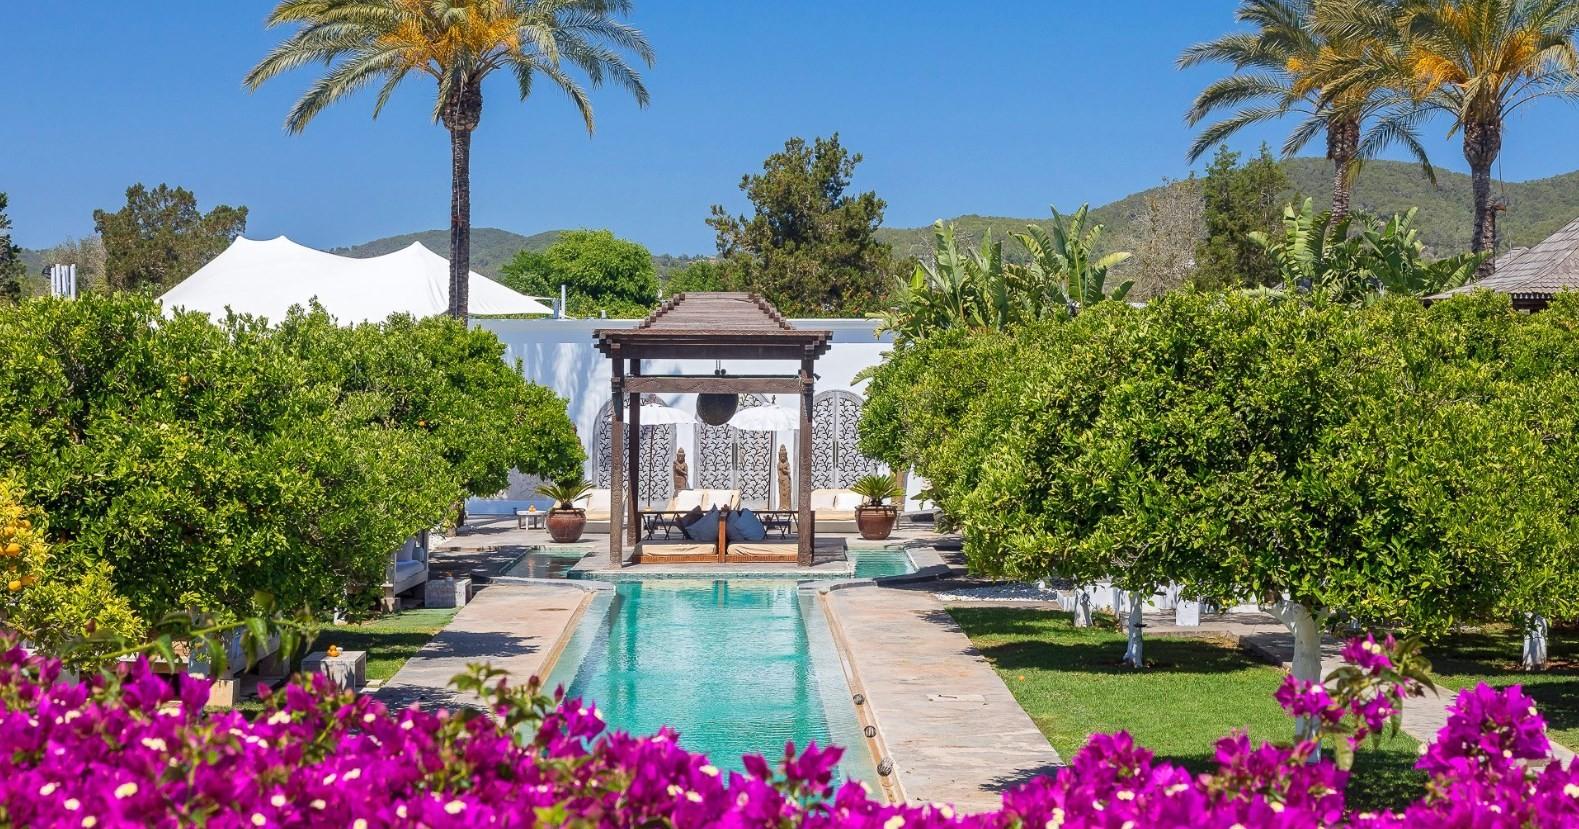 news-main-ibizas-atzaro-agroturismo-hotel-reopens-june-26.1591133363.jpg